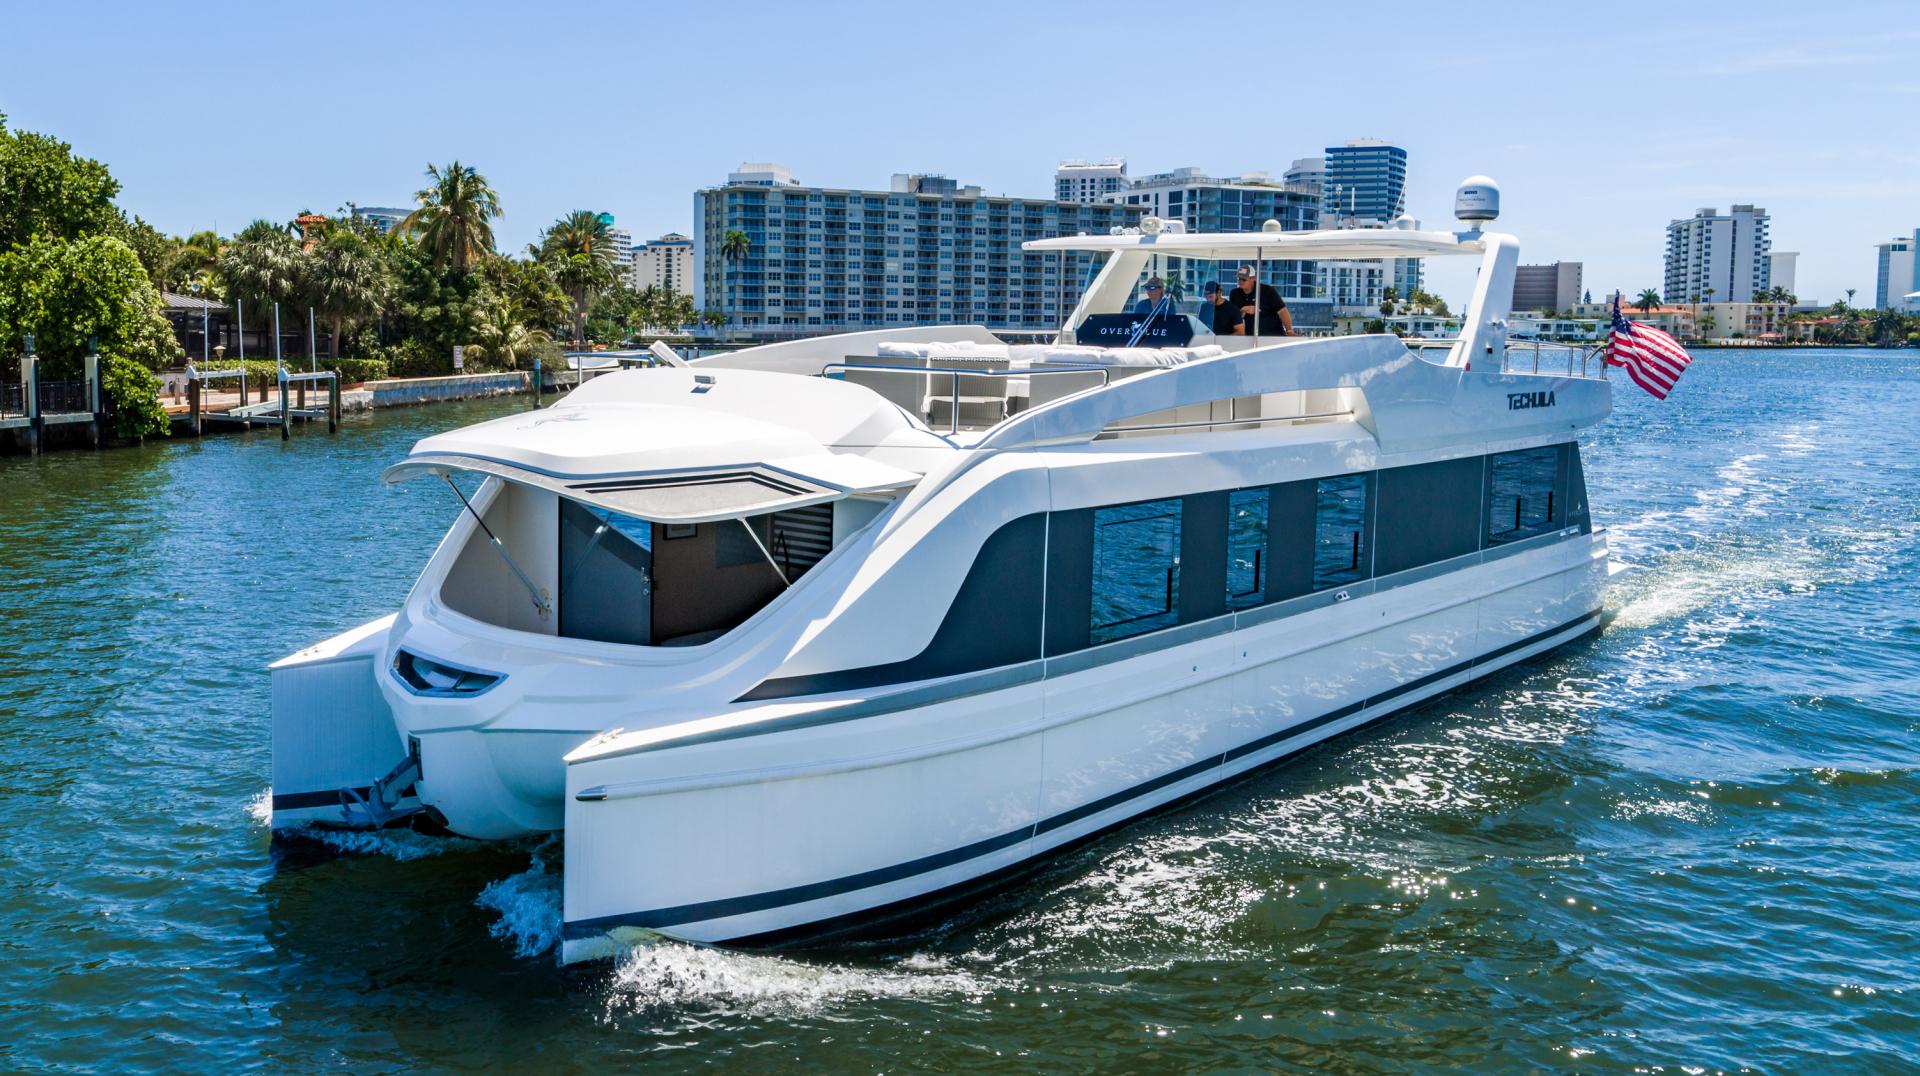 Overblue-58 Power Catamaran 2017-Techuila Ft. Lauderdale-Florida-United States-2017 Overblue 58 Powercat-1401112   Thumbnail